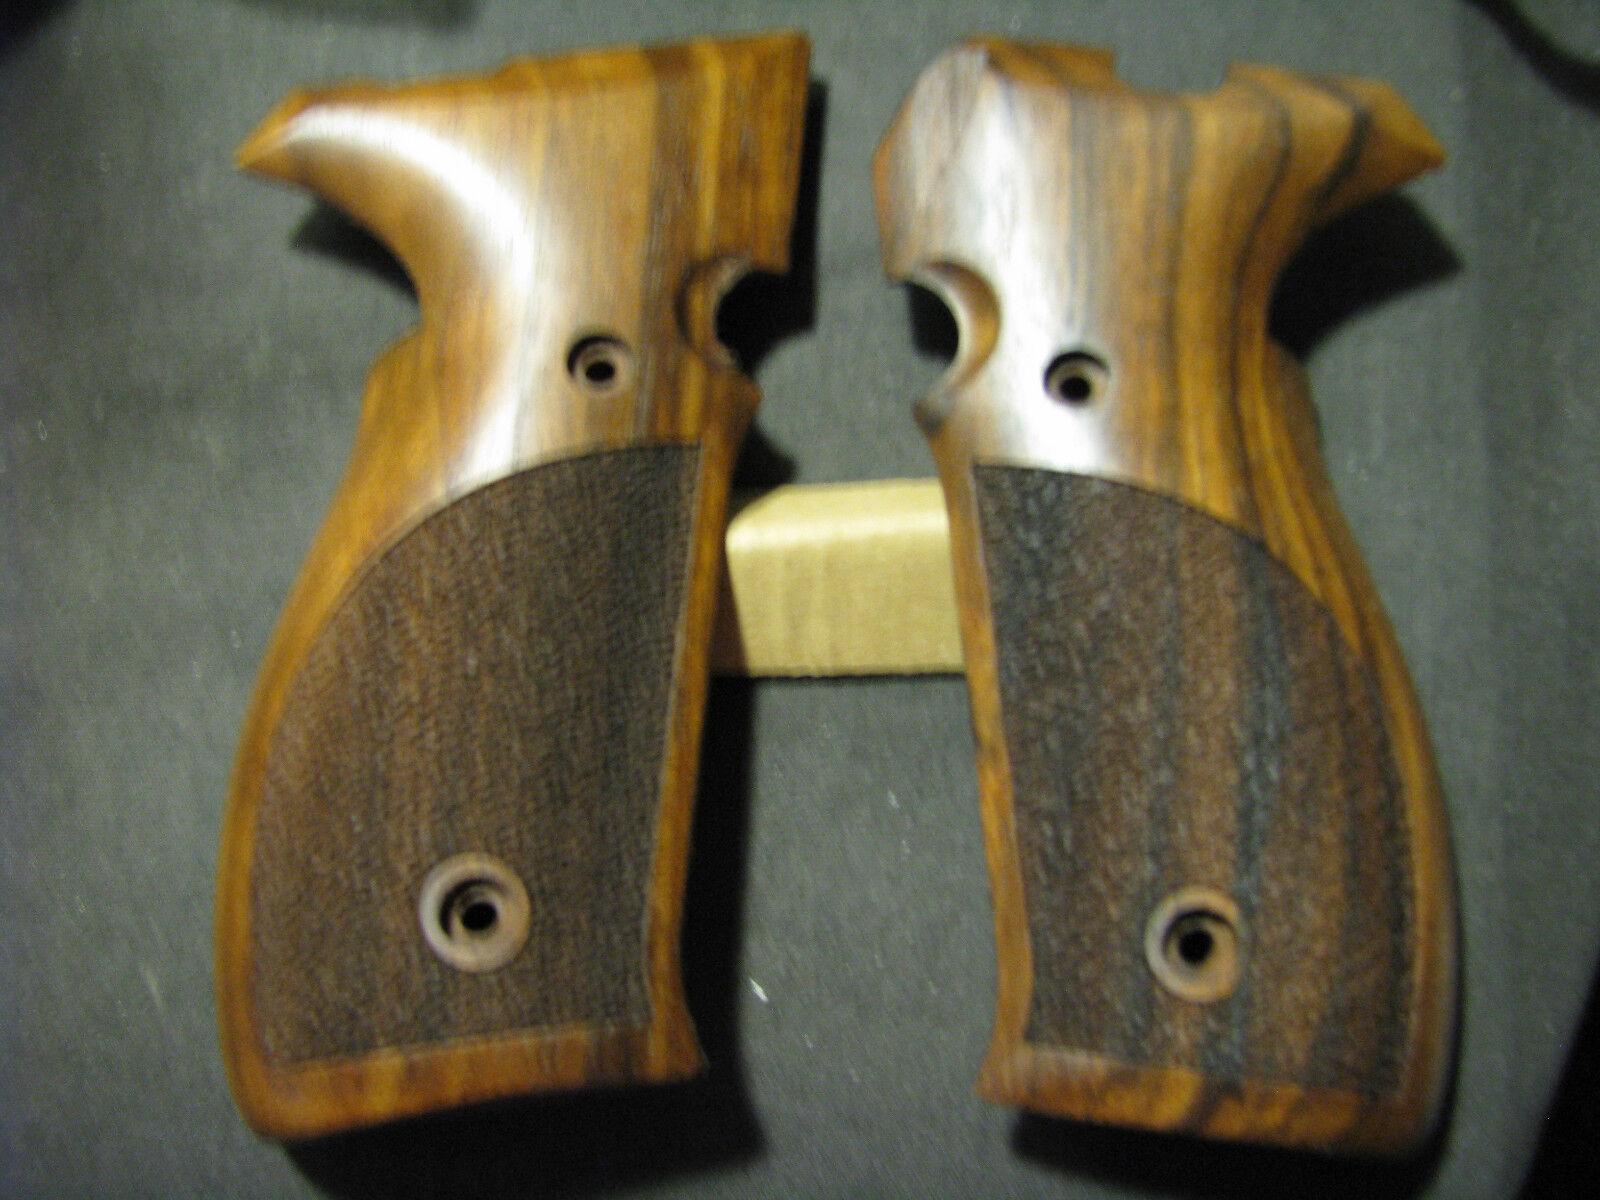 Pistola apretones para SIG MOSQUITO GSG Firefly Nogal eritrosis interfolicular en collar-Hermoso